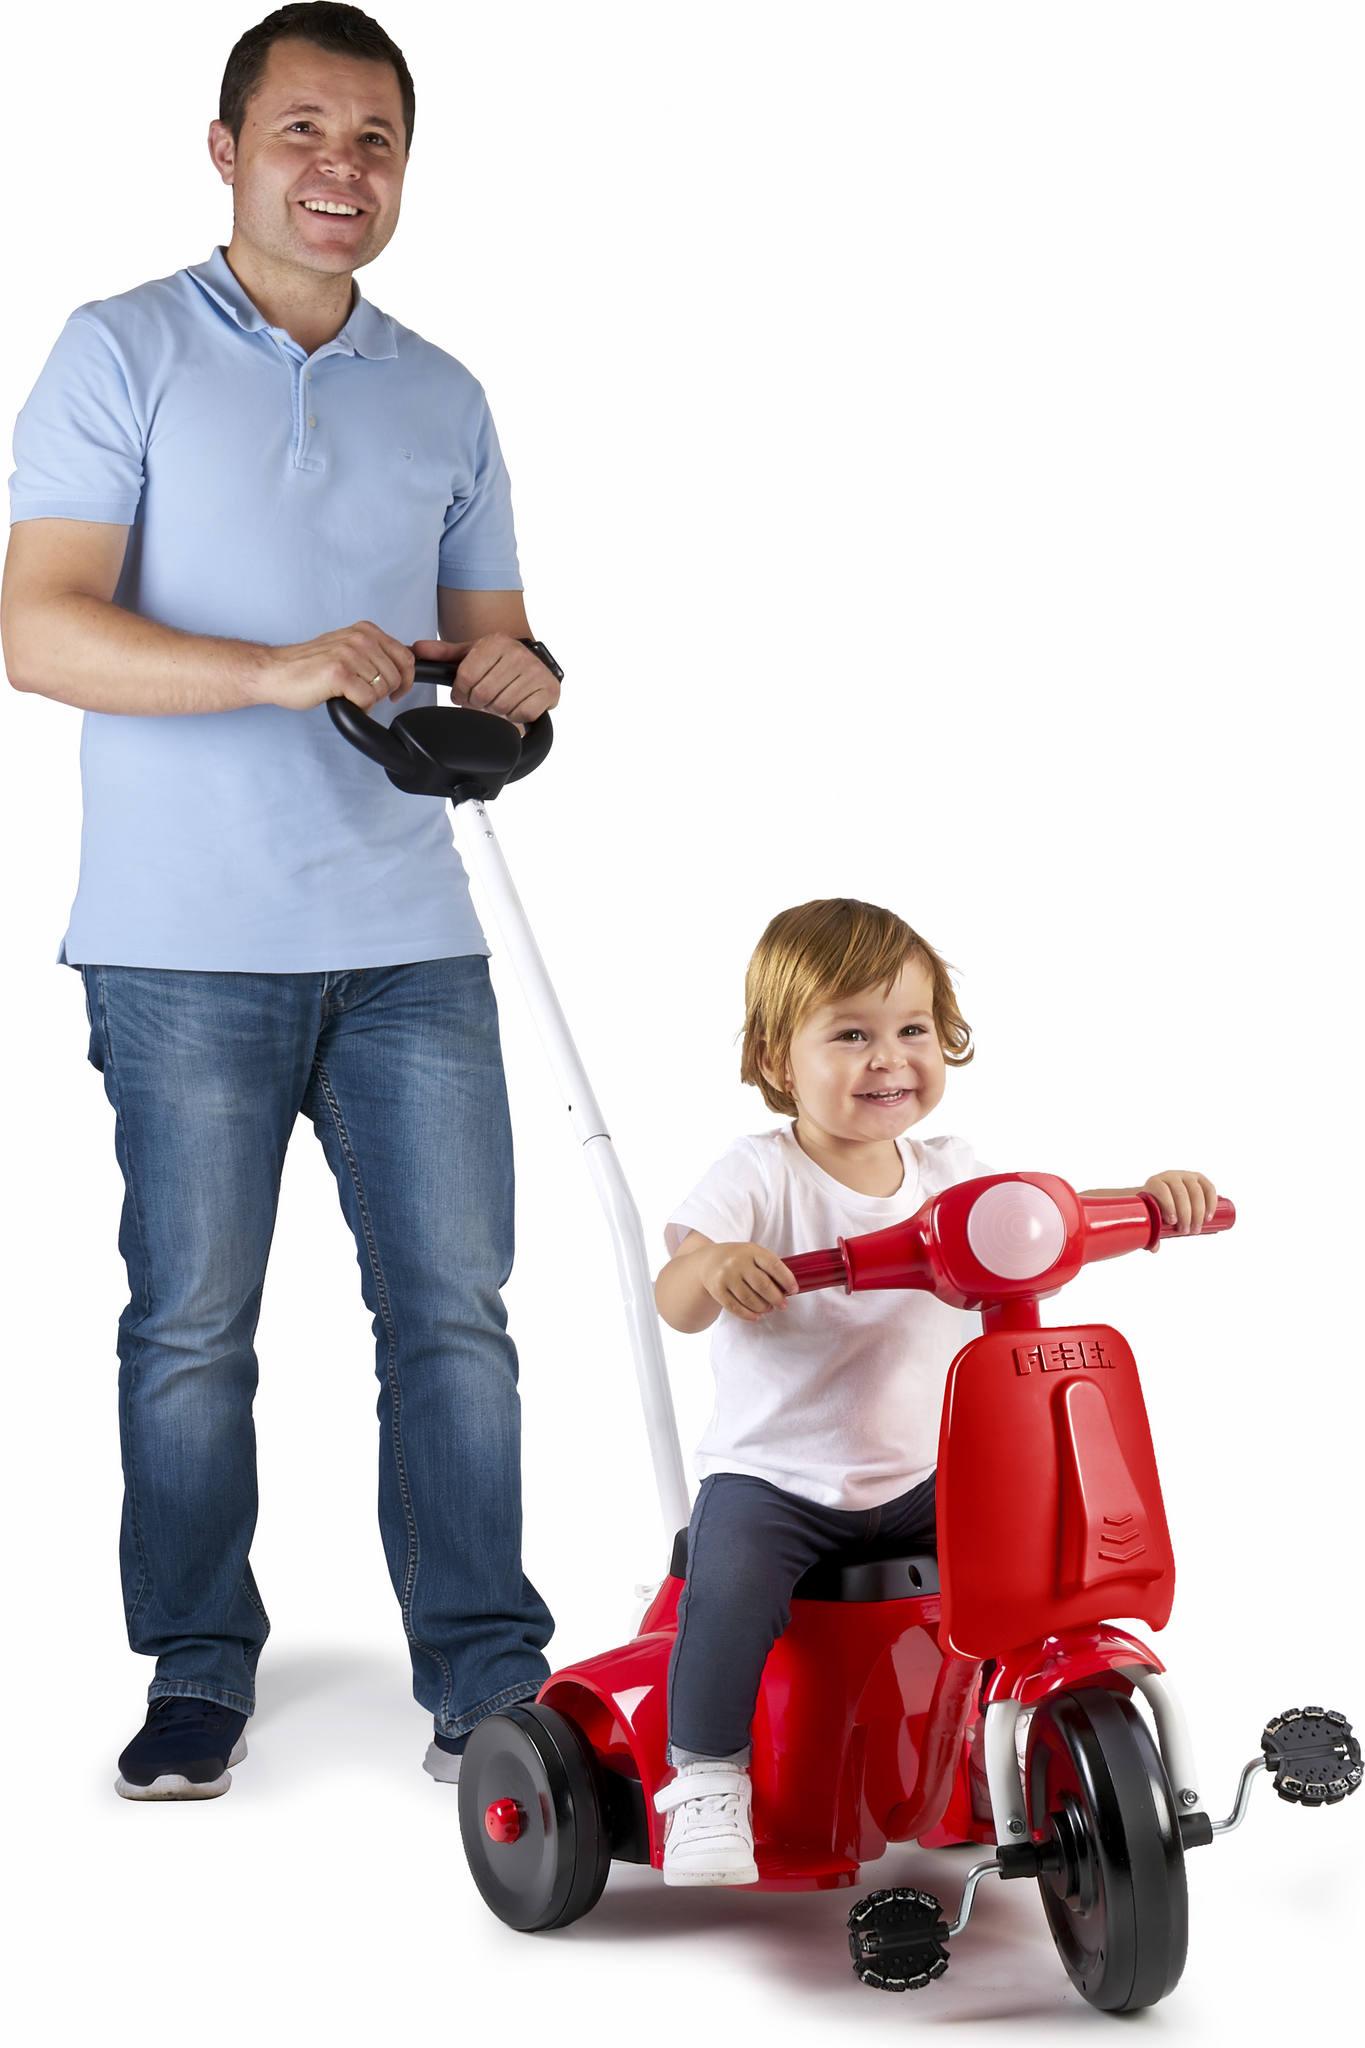 MOTO SCOOTER 3X1 6V 12392 - N14619